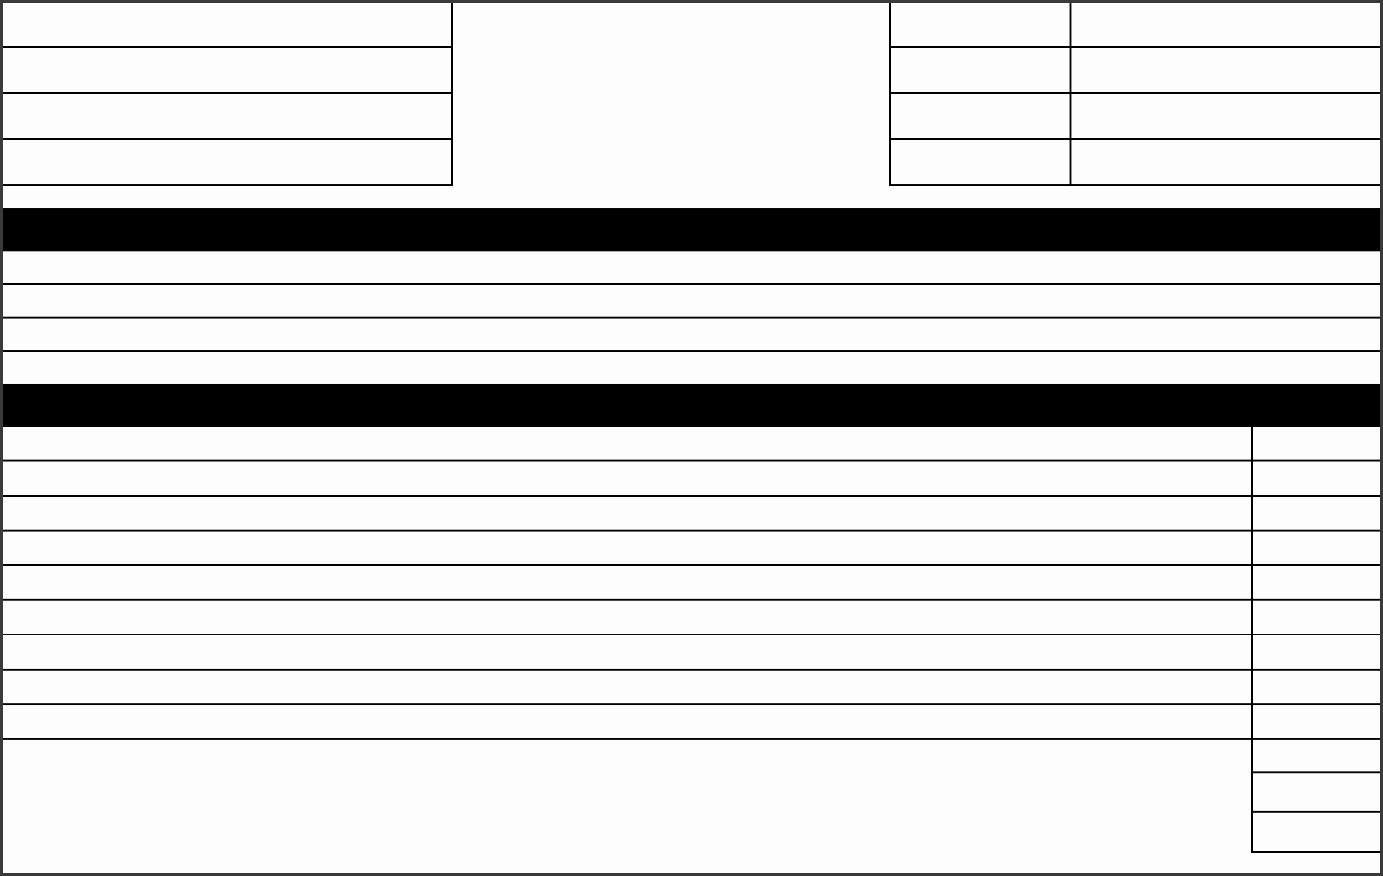 free printable job estimate form template in pdf